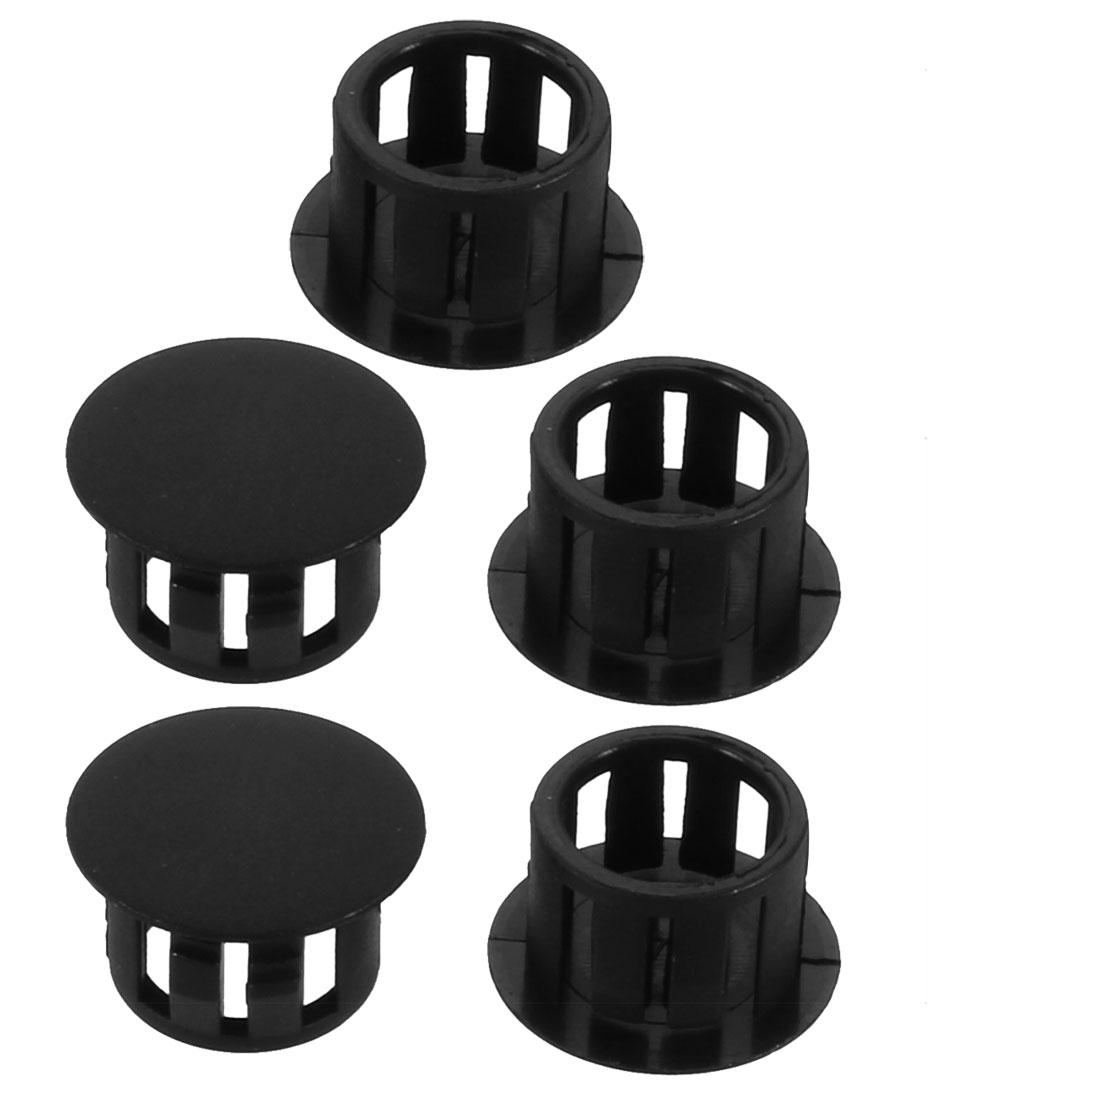 5pcs 13mm Dia Black Plastic Tubing Plug Door and Window Locking Hole Plugs